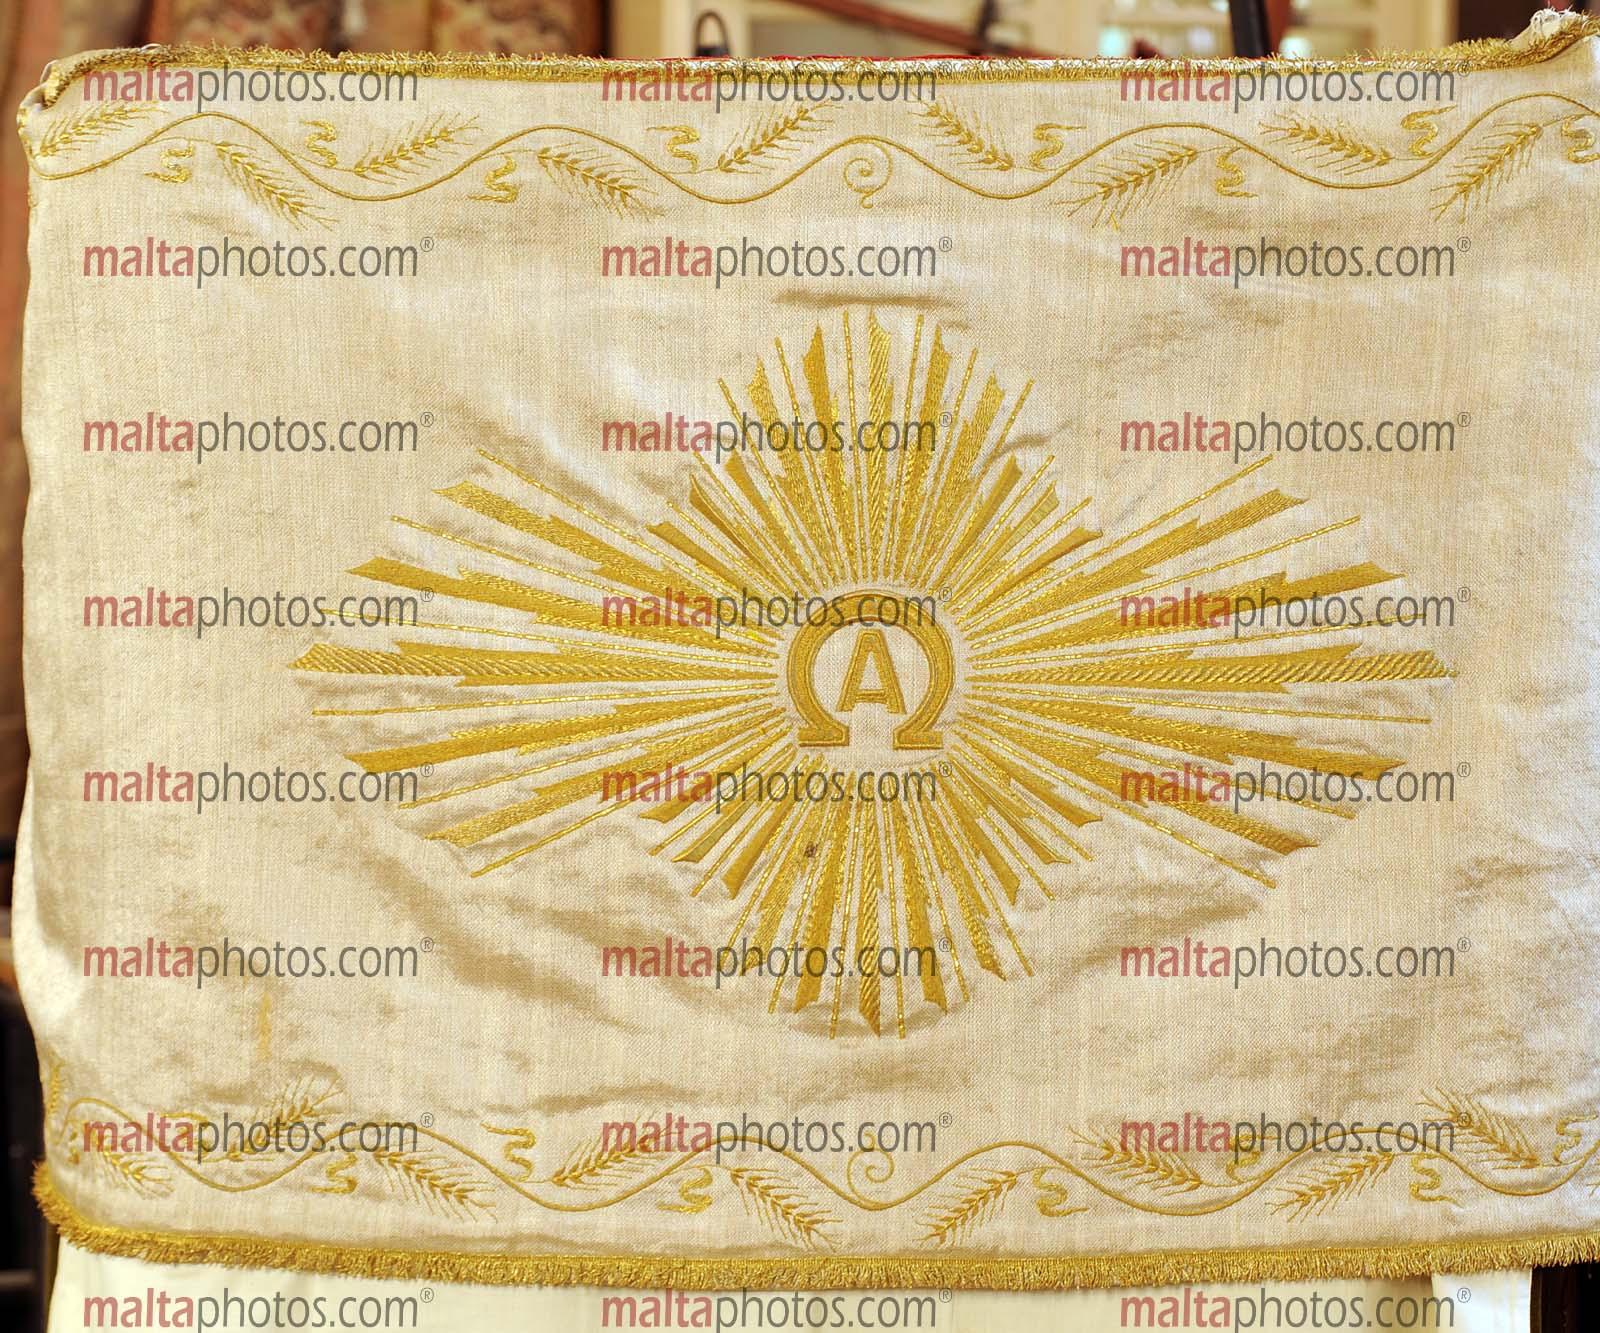 Home / Malta Photos / Church Patrimony